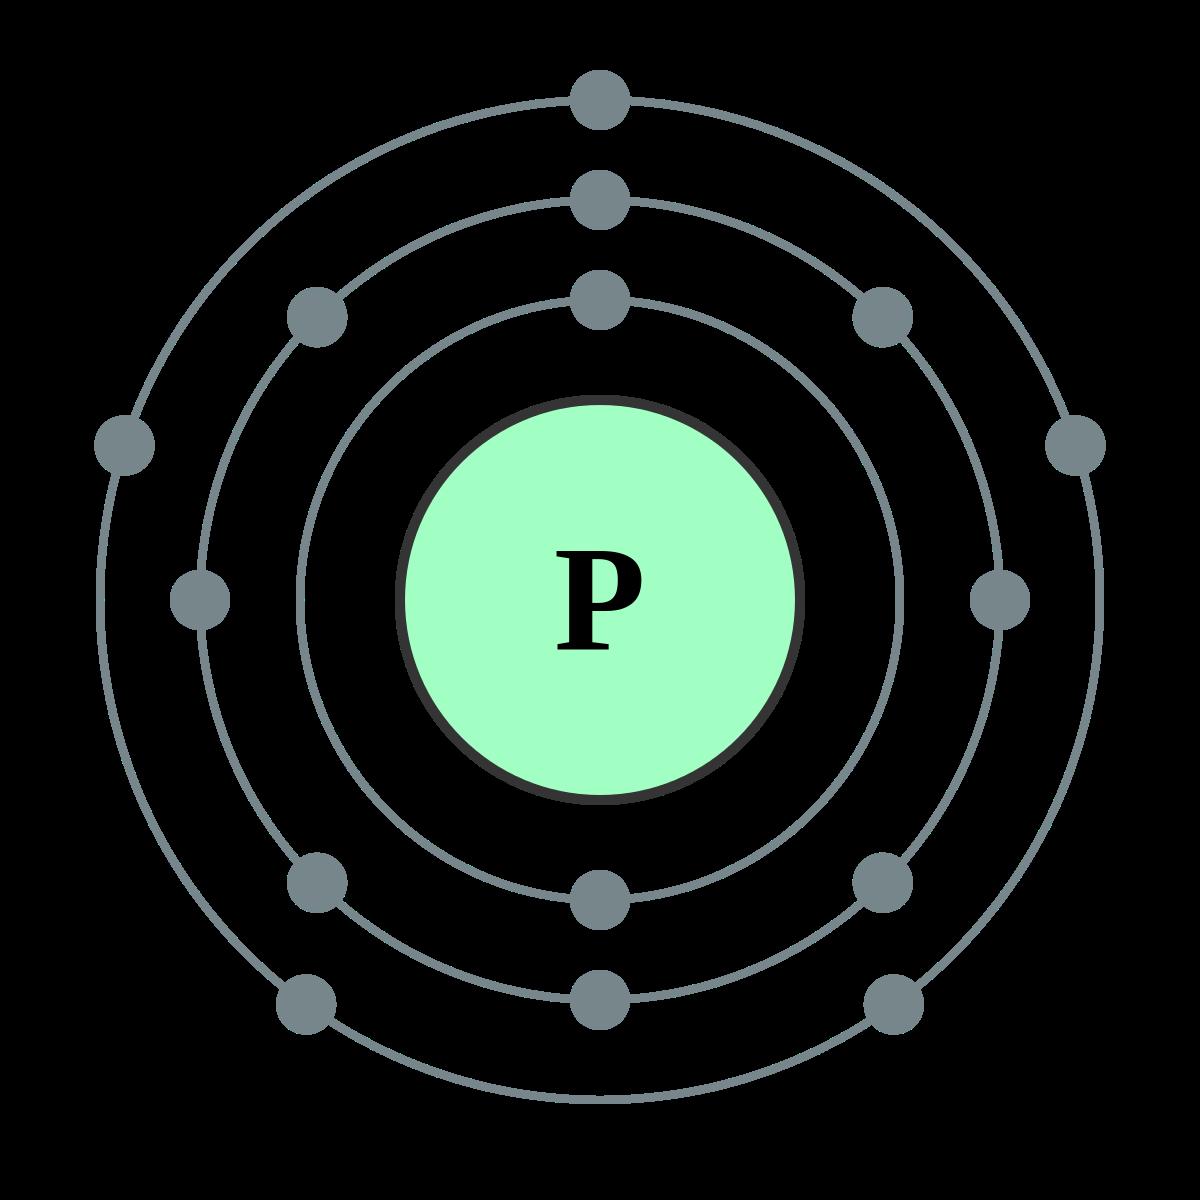 fosfor wikipedia [ 1200 x 1200 Pixel ]